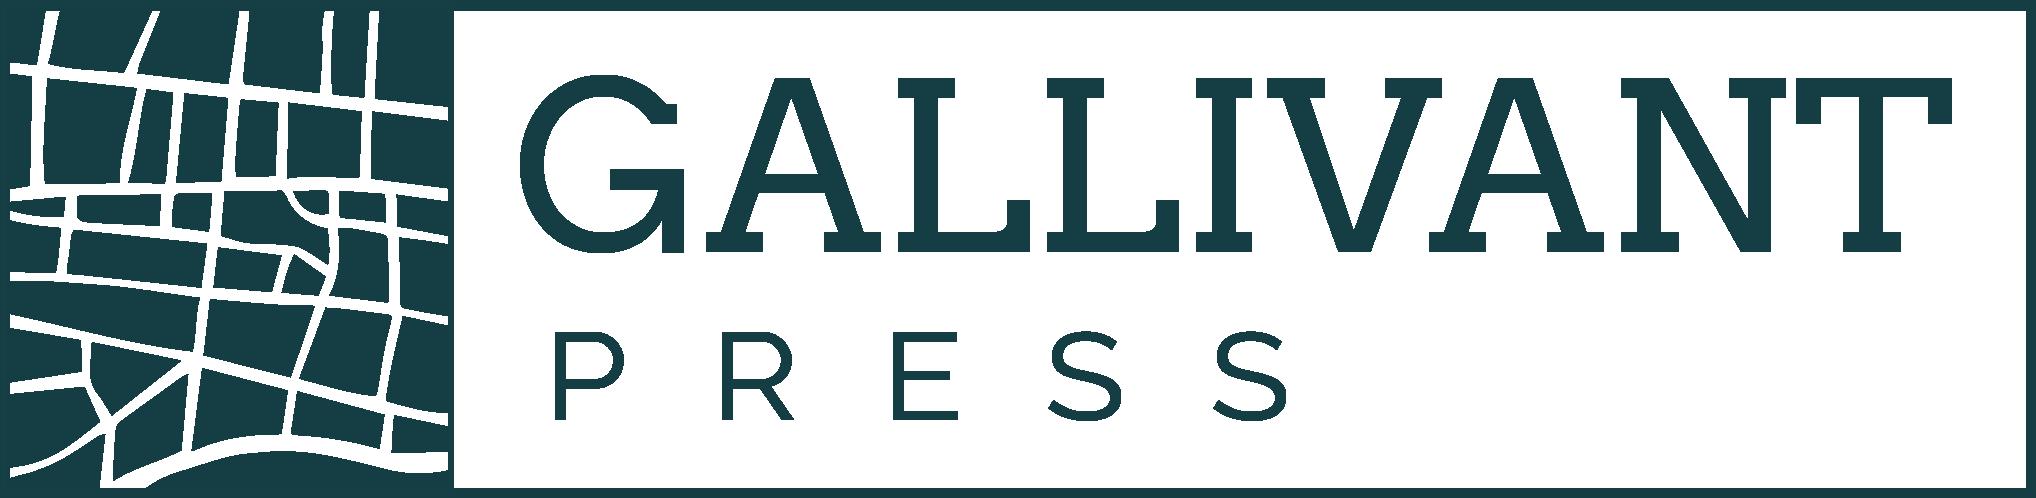 Gallivant Press